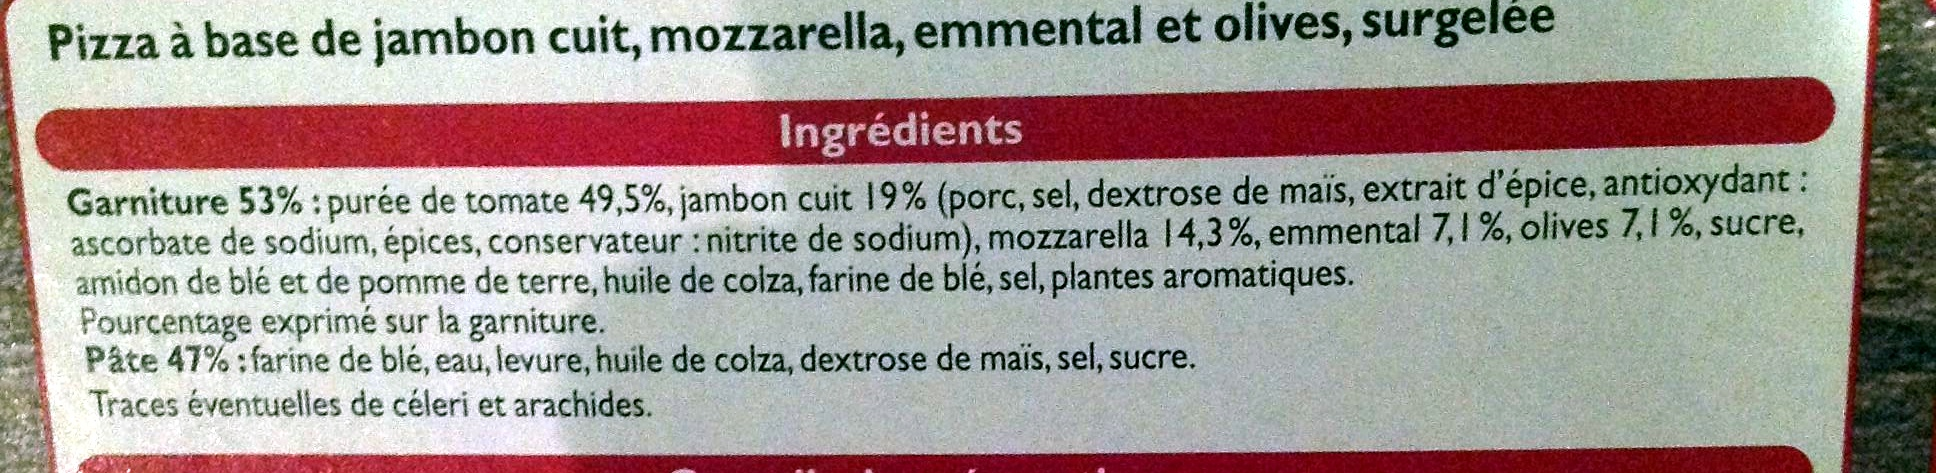 Pizza Jambon Fromage, Cuite sur pierre - Ingredients - fr